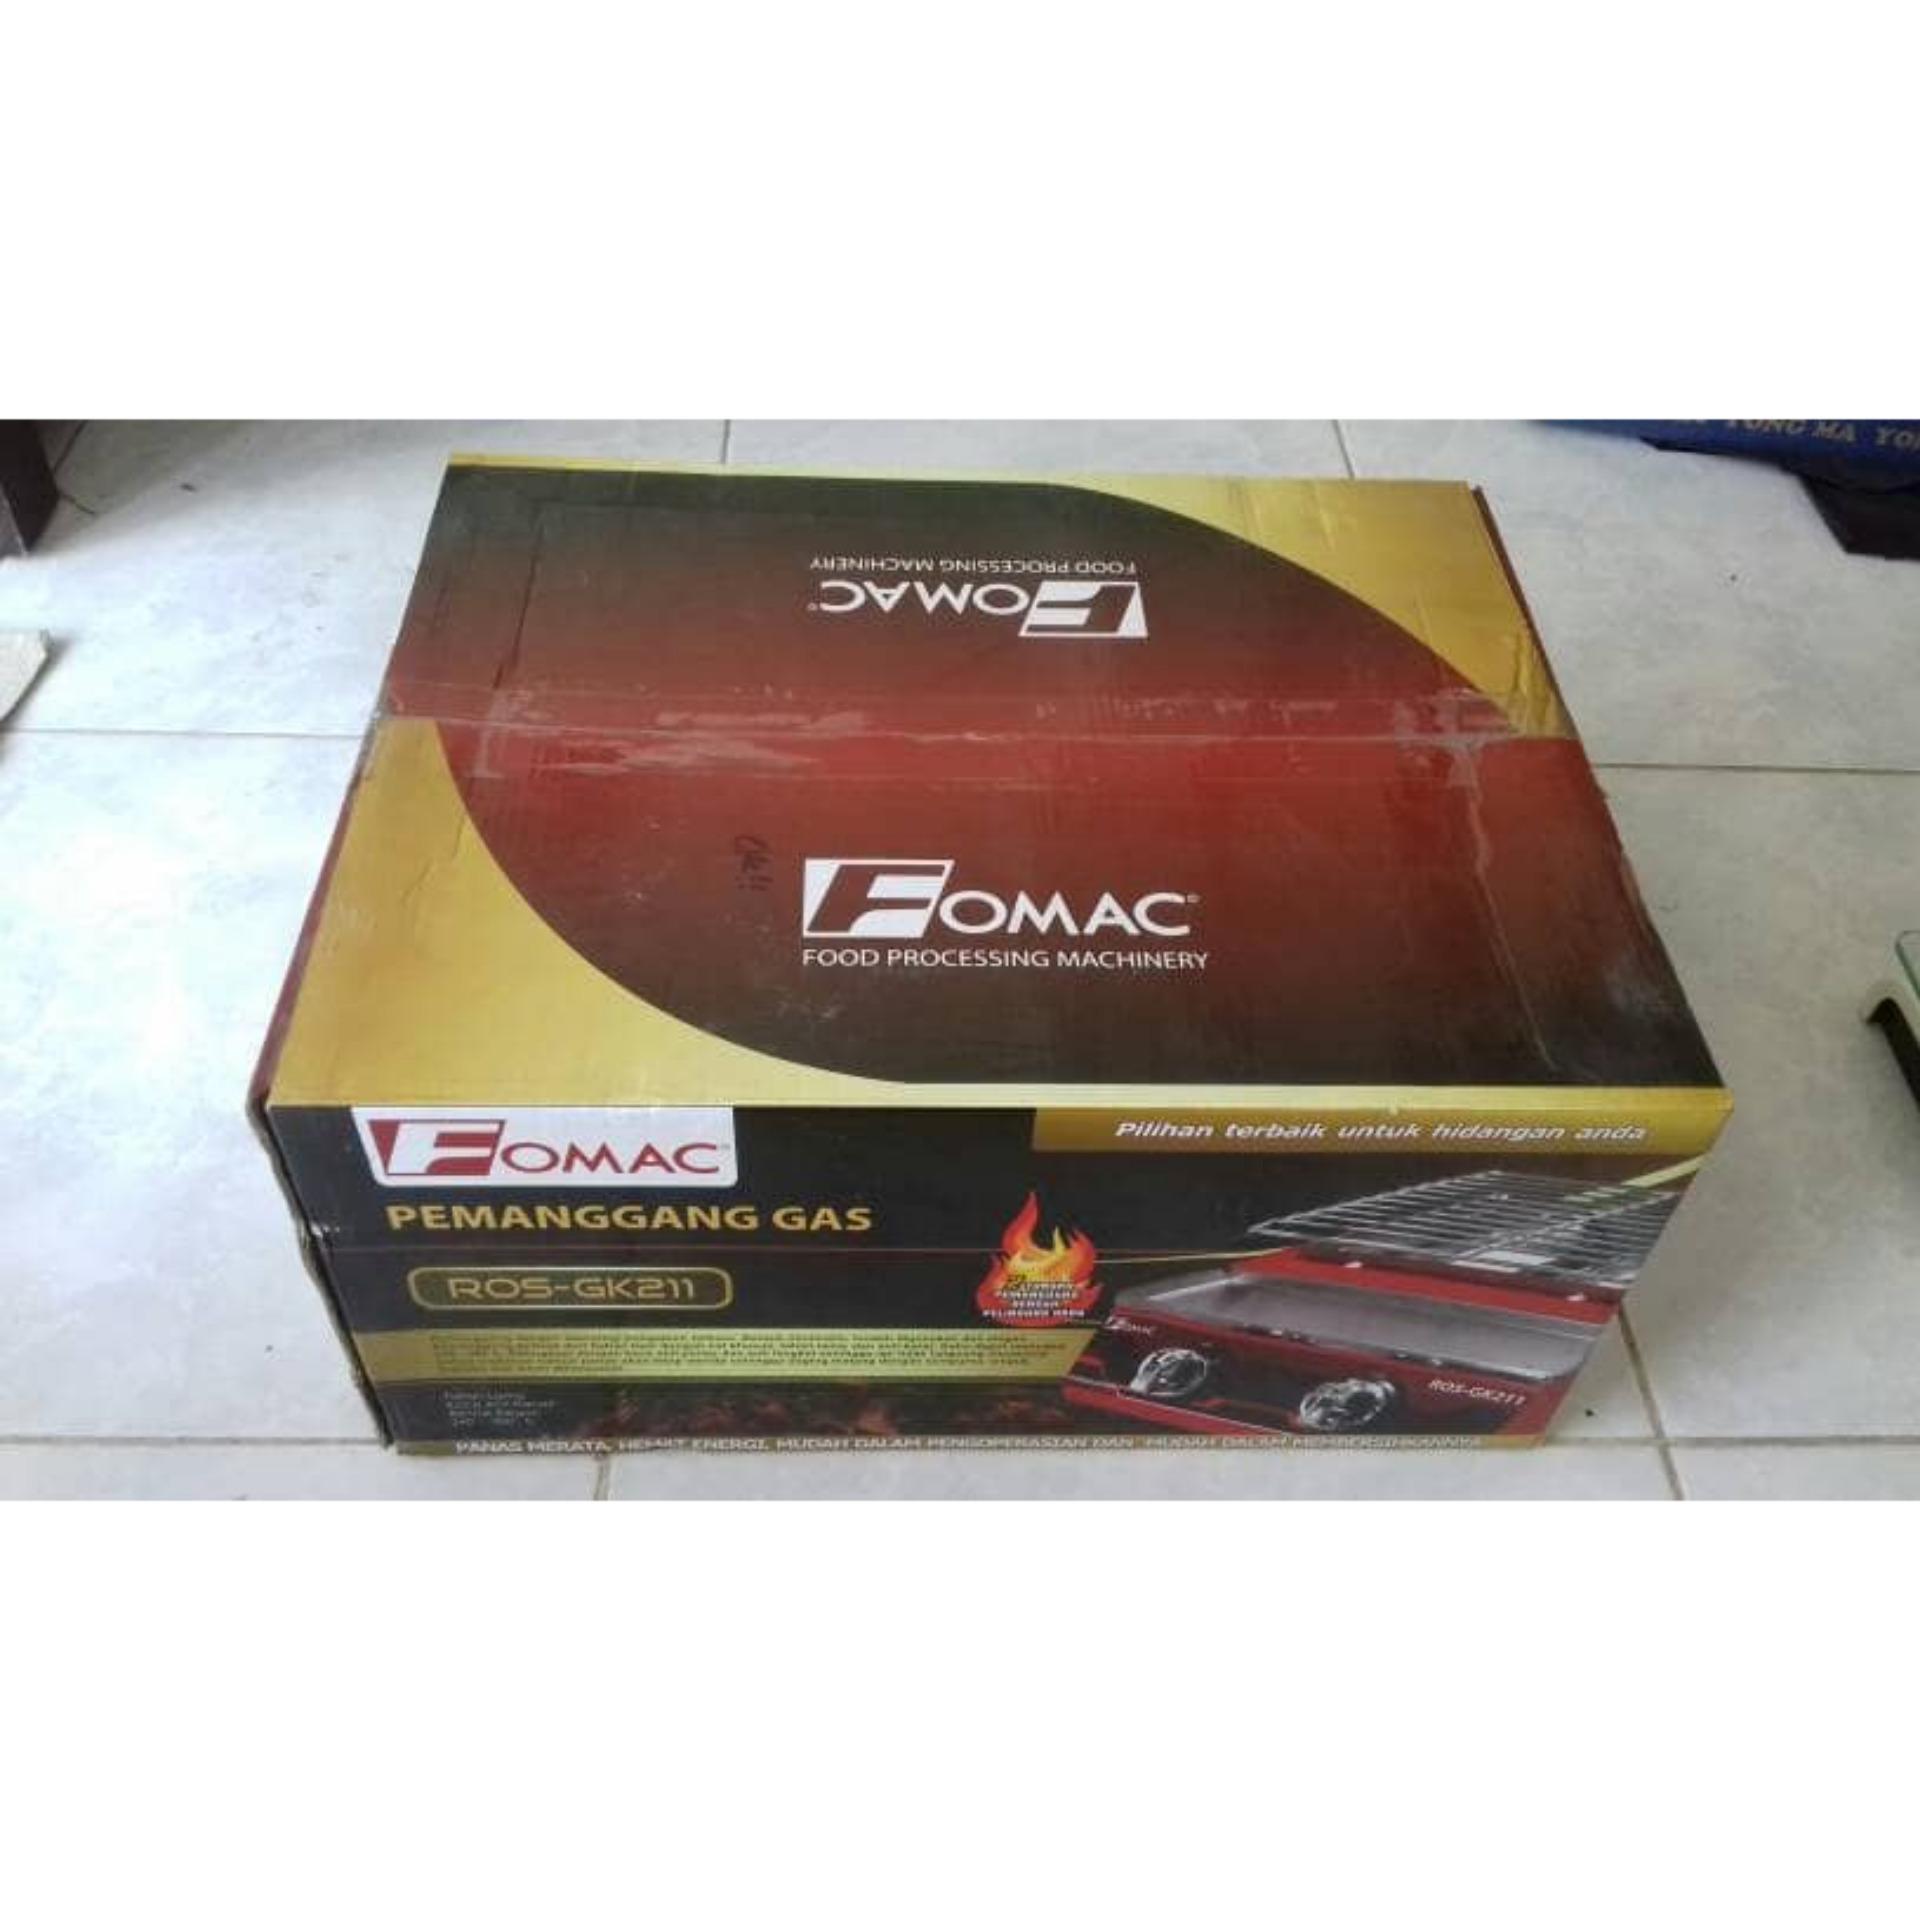 ... Fomac Kompor Panggang Gas 2 Tungku ROS-GK211 ...